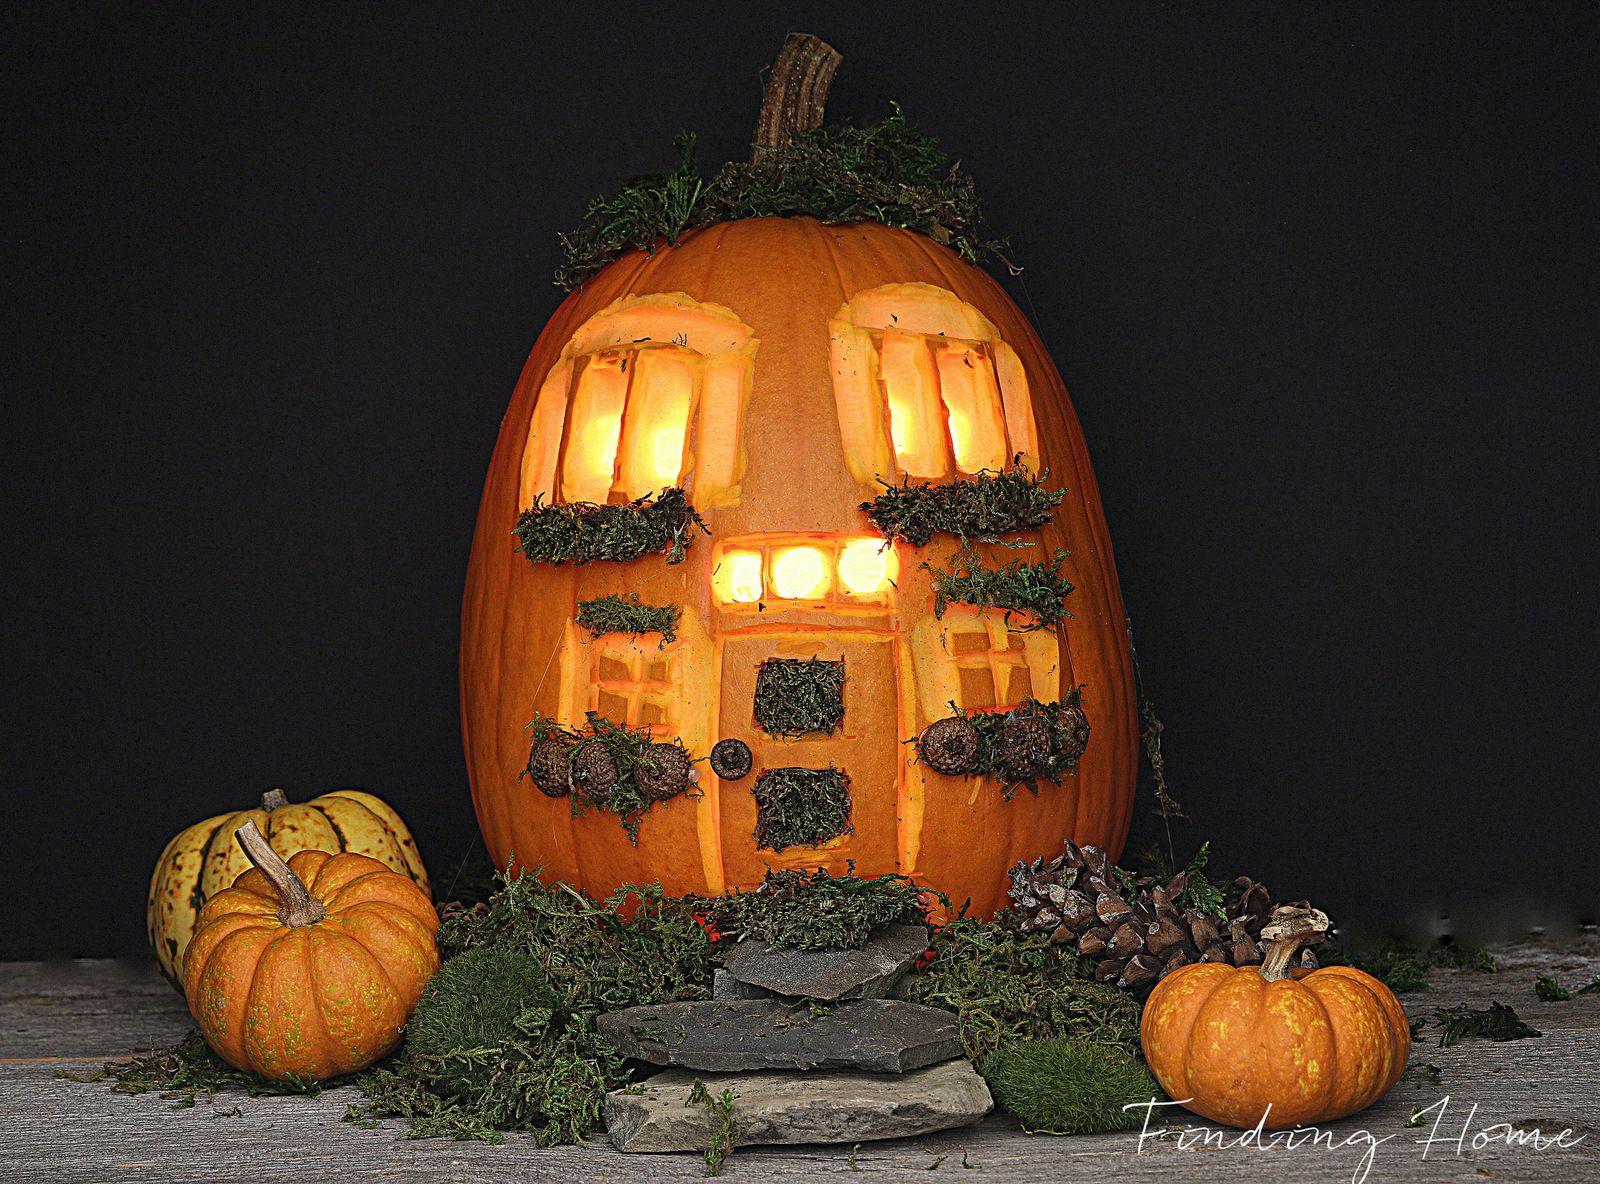 50 Easy Pumpkin Carving Ideas Fun Patterns Designs For 2018 Jack O Lanterns